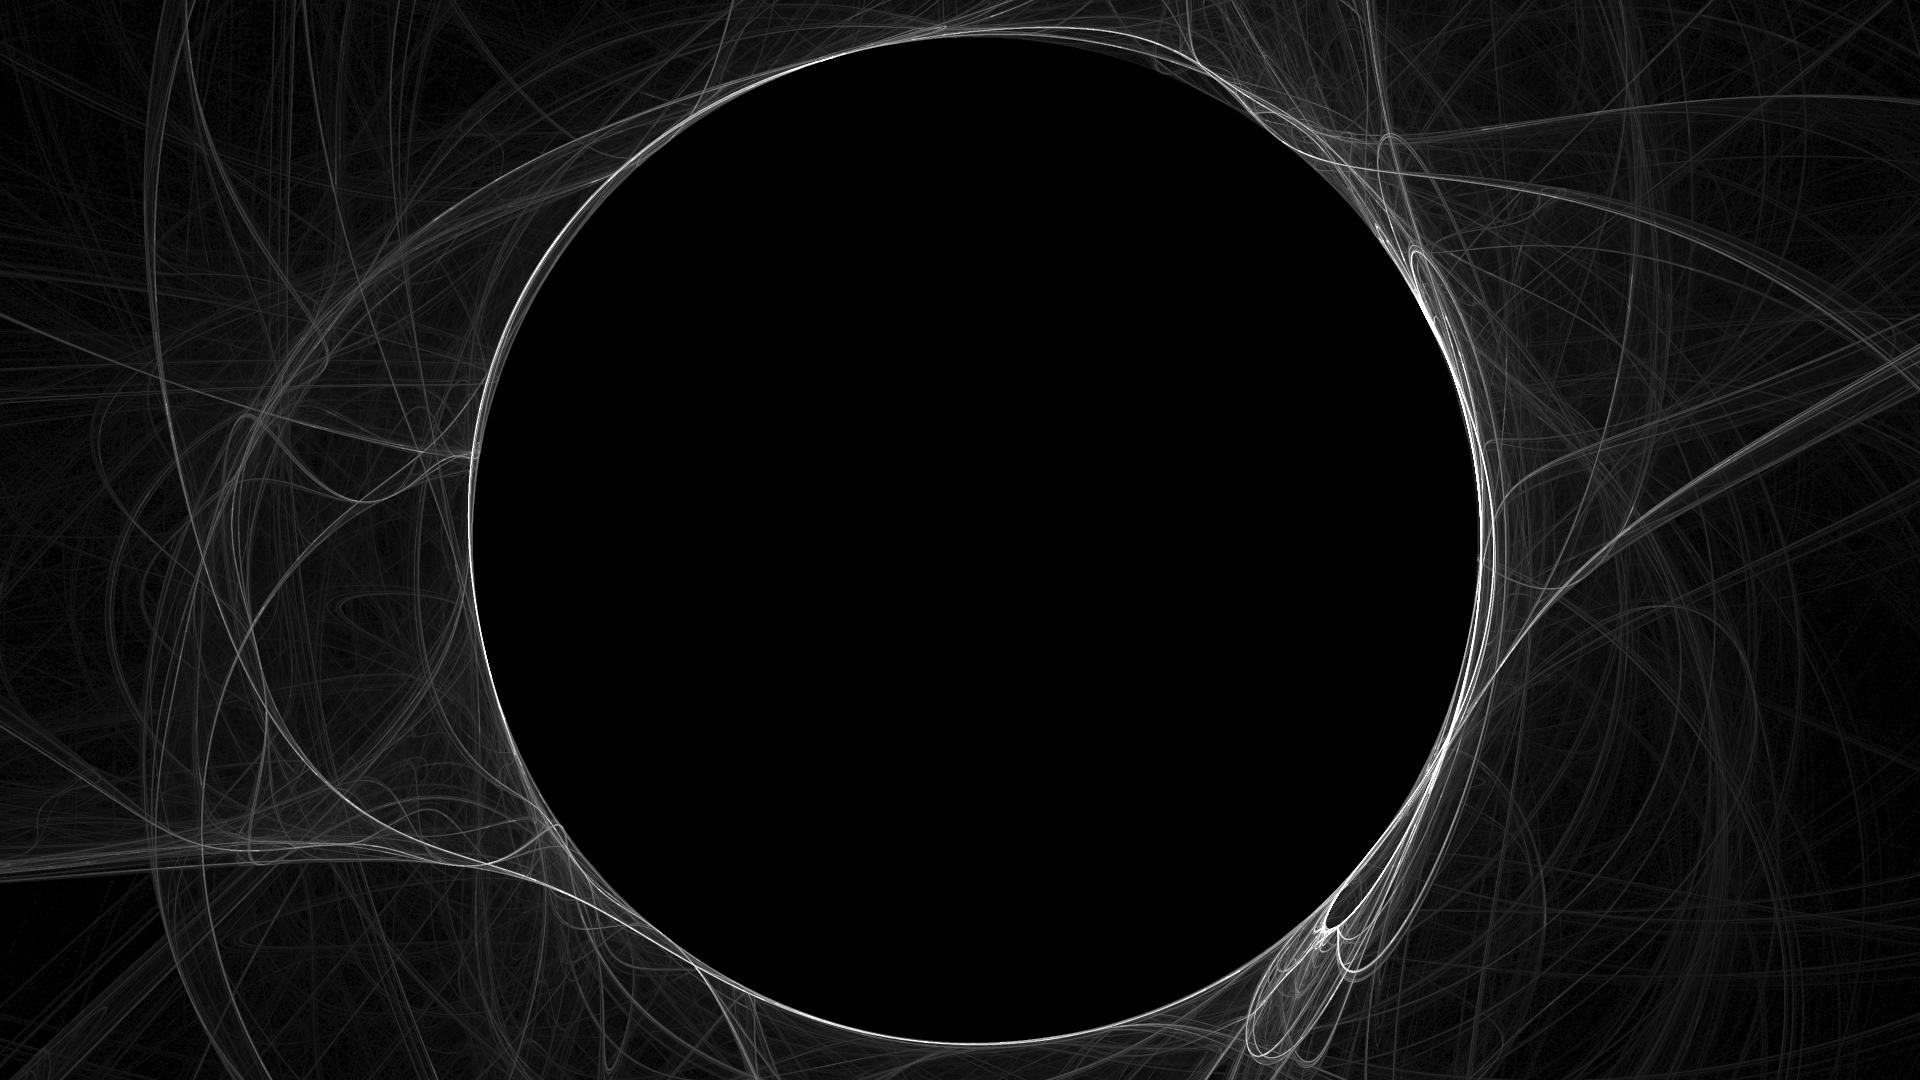 black hole - DriverLayer Search Engine